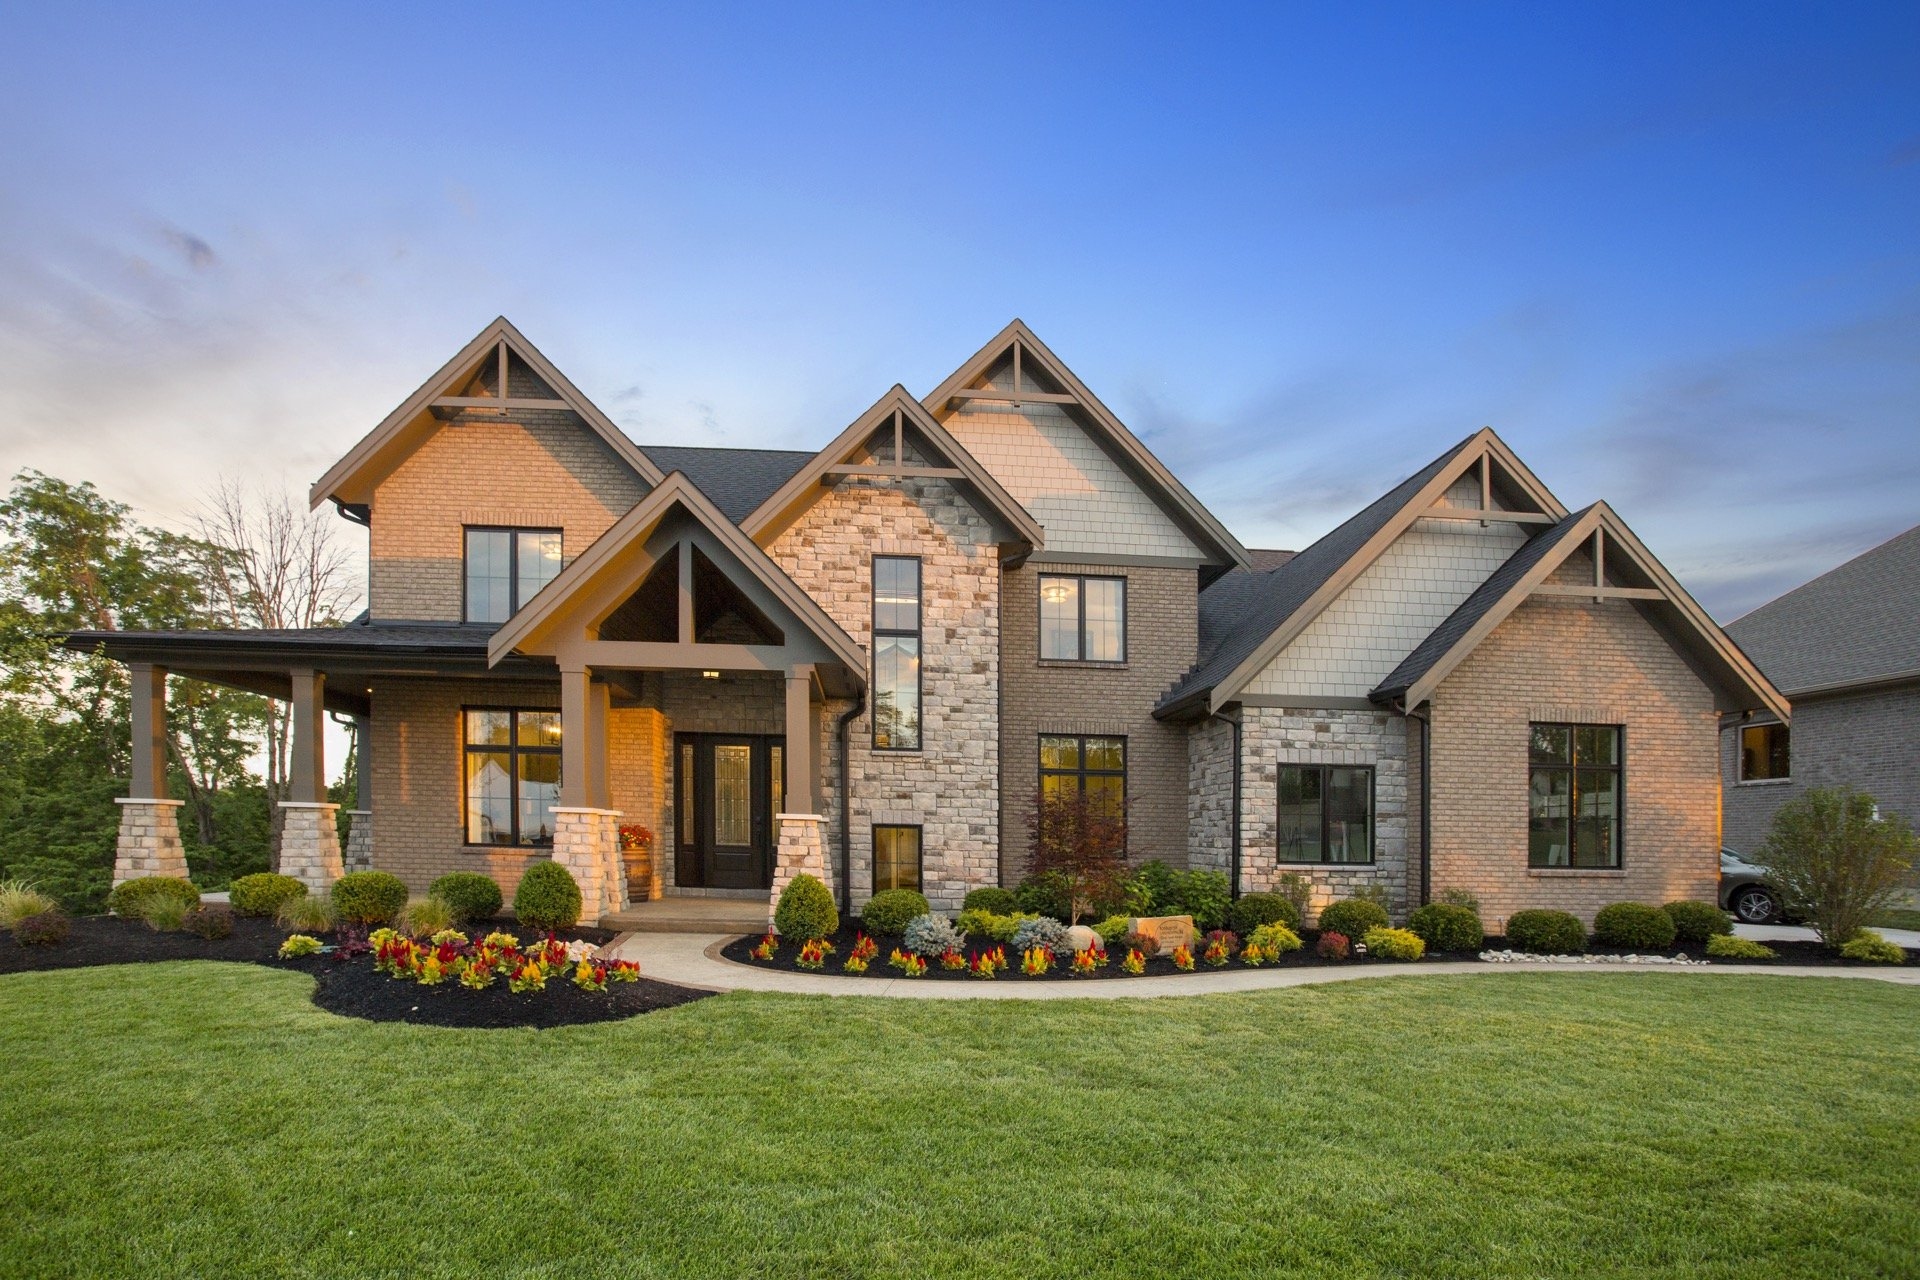 Homes by Gerbus